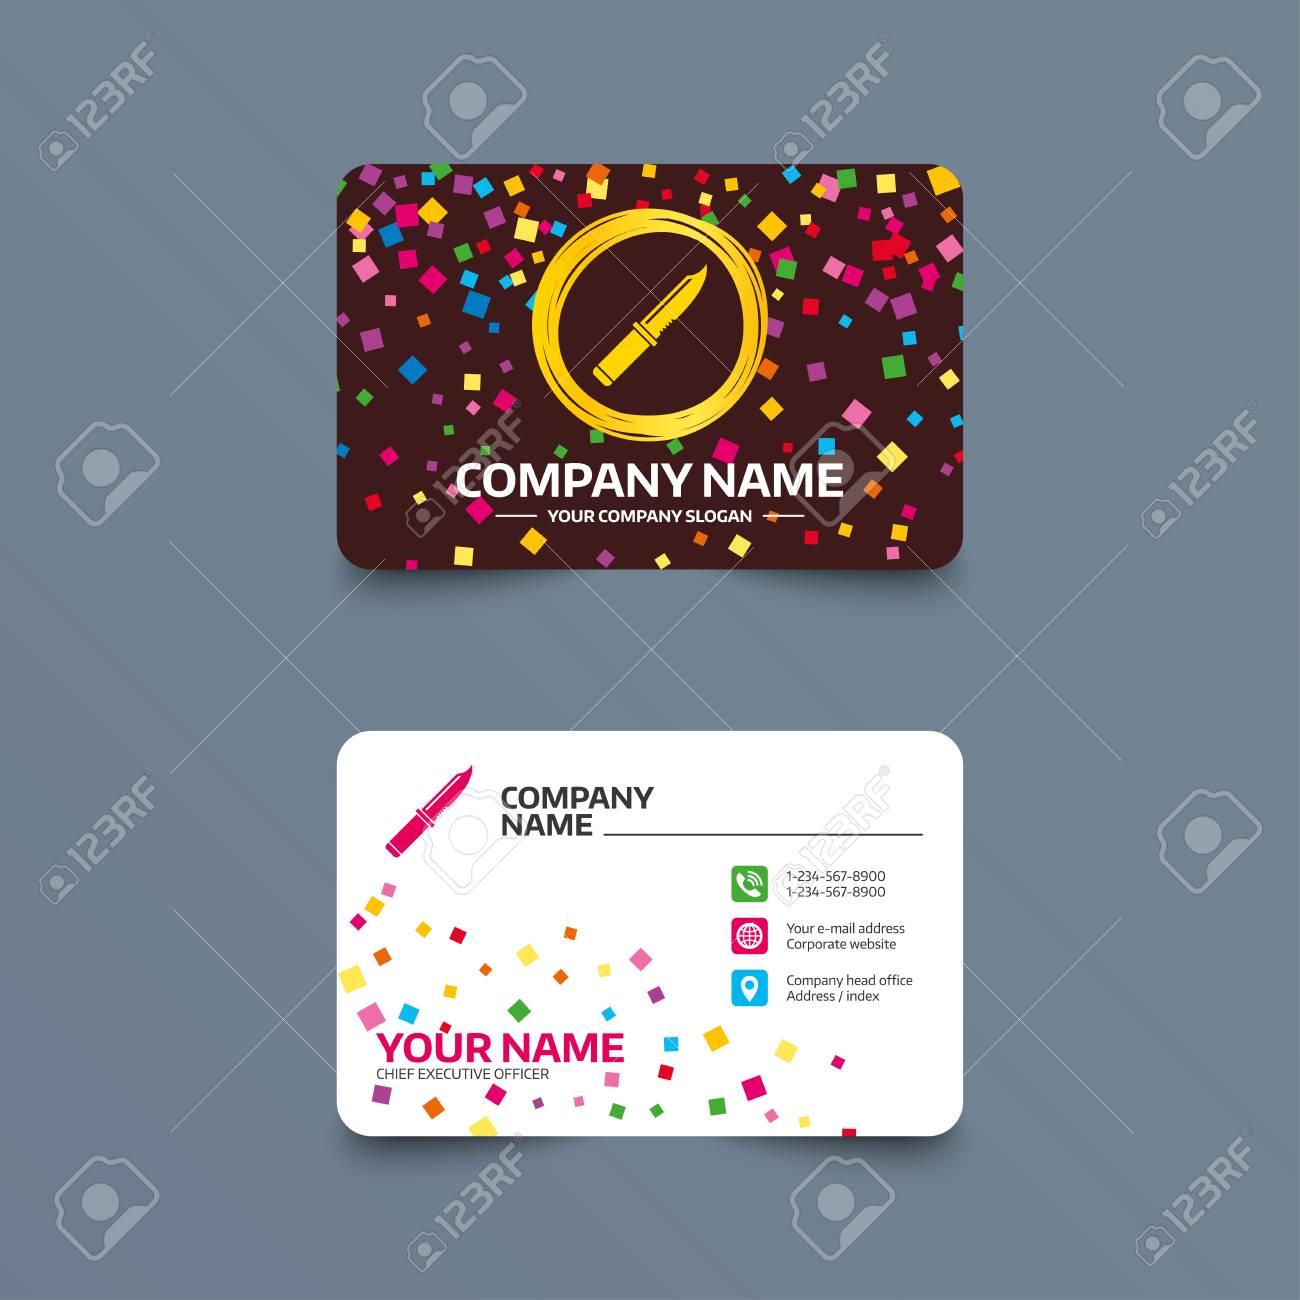 Business card template with confetti pieces knife sign icon business card template with confetti pieces knife sign icon edged weapons symbol stab colourmoves